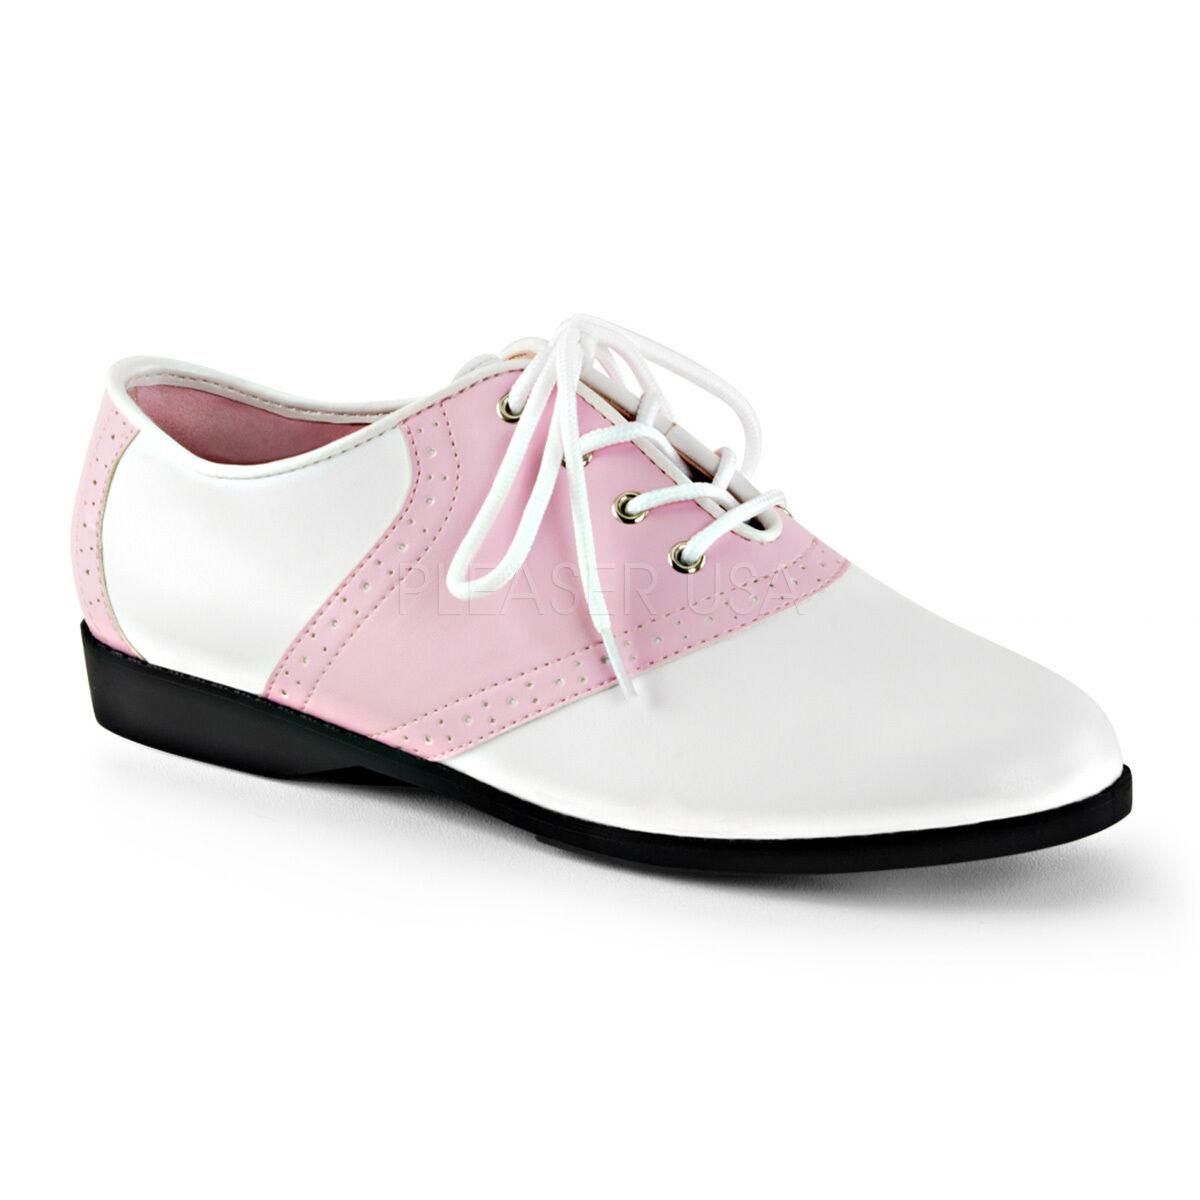 SAD50 BP-WPU Women's Baby Pink & White Retro 50's Halloween Costume Saddle shoes